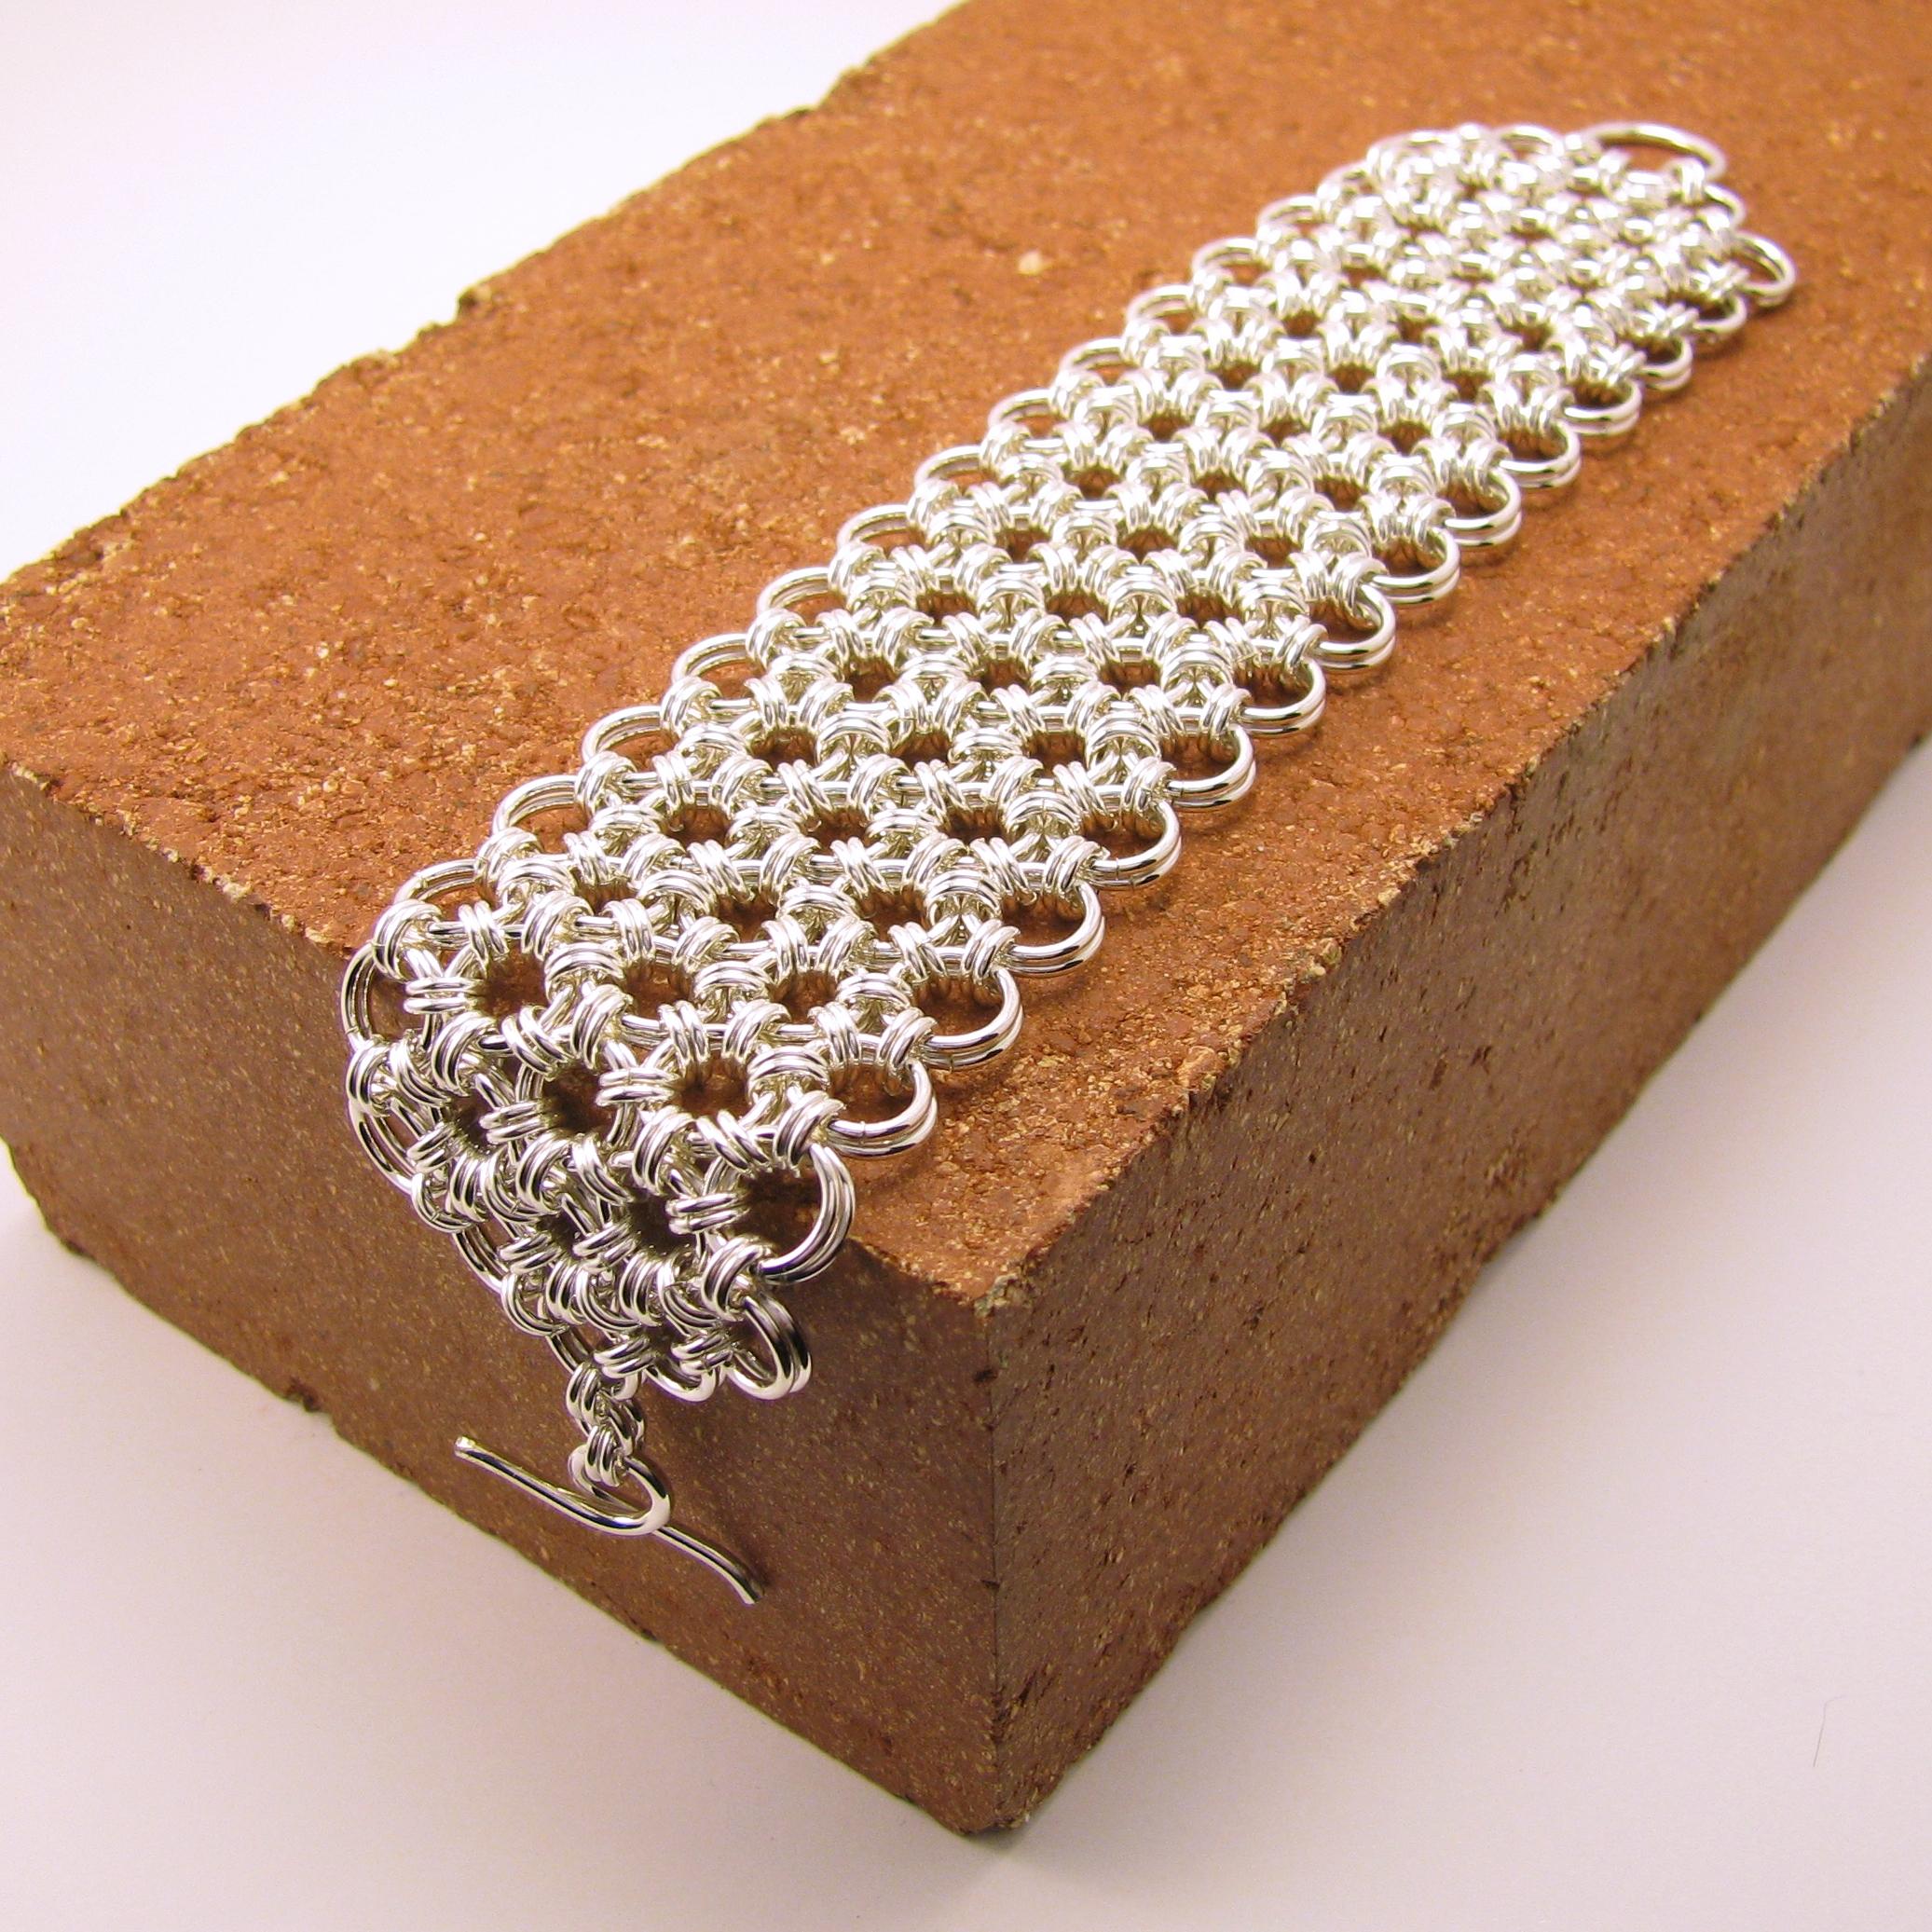 Japanese Lace 5 Row Bracelet.jpg